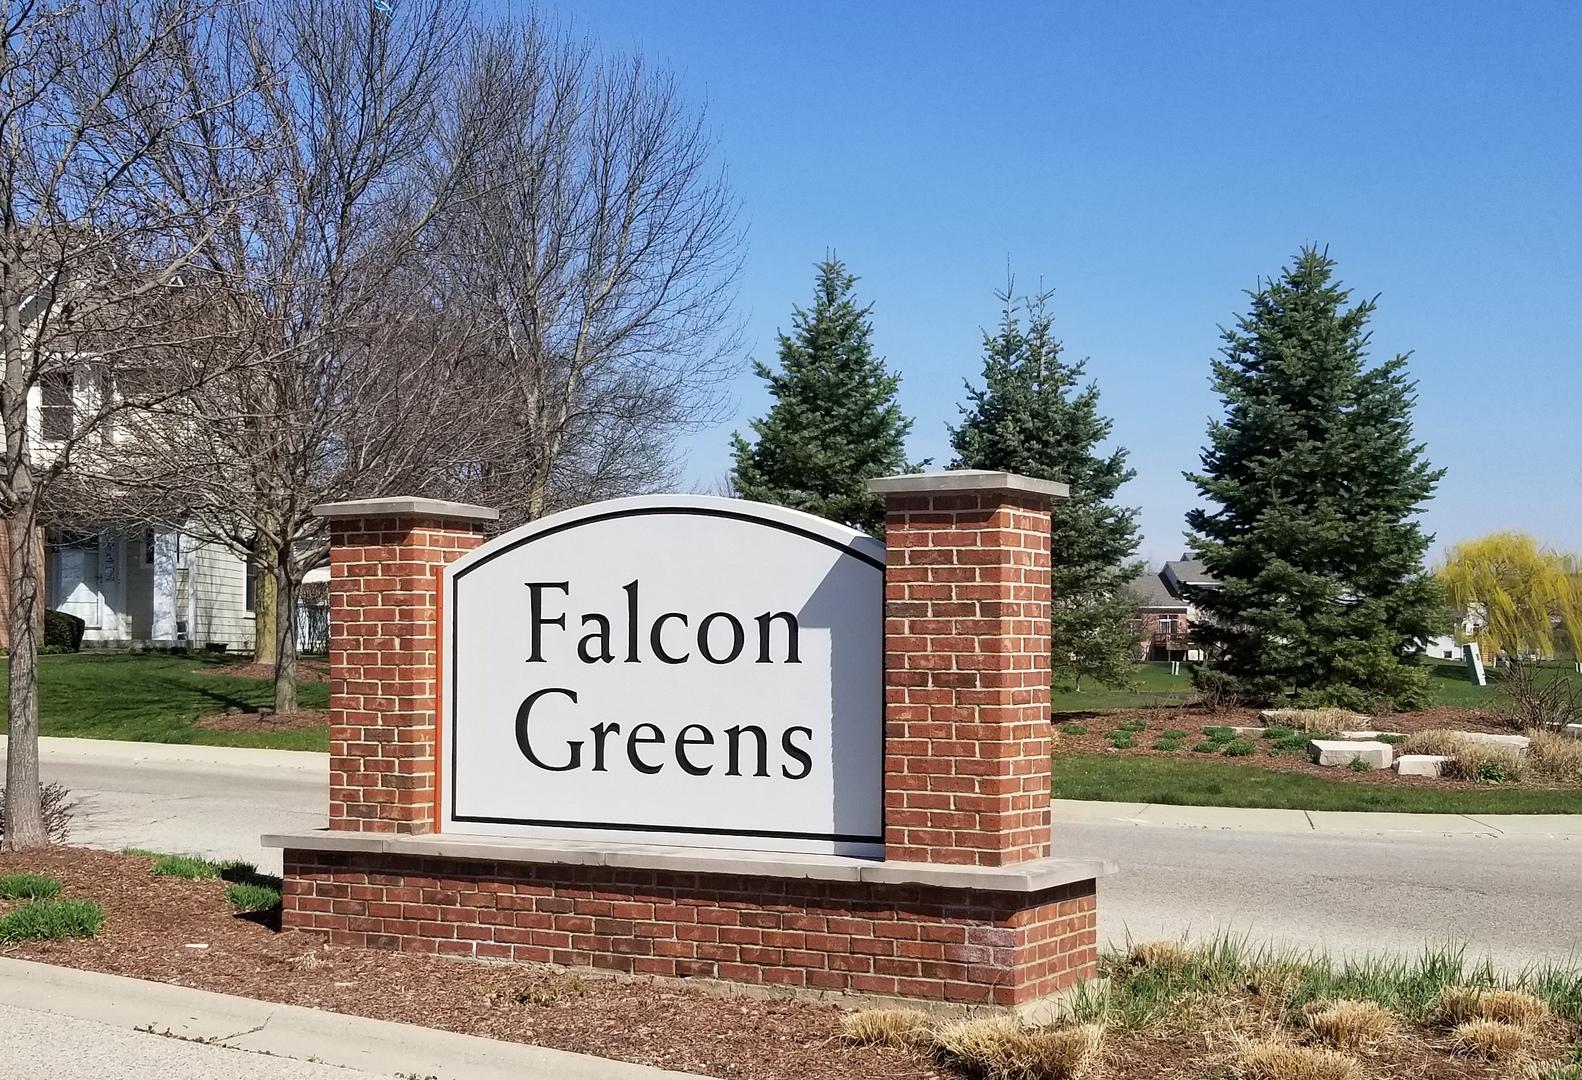 9045 Falcon Greens, Lakewood, Illinois, 60014